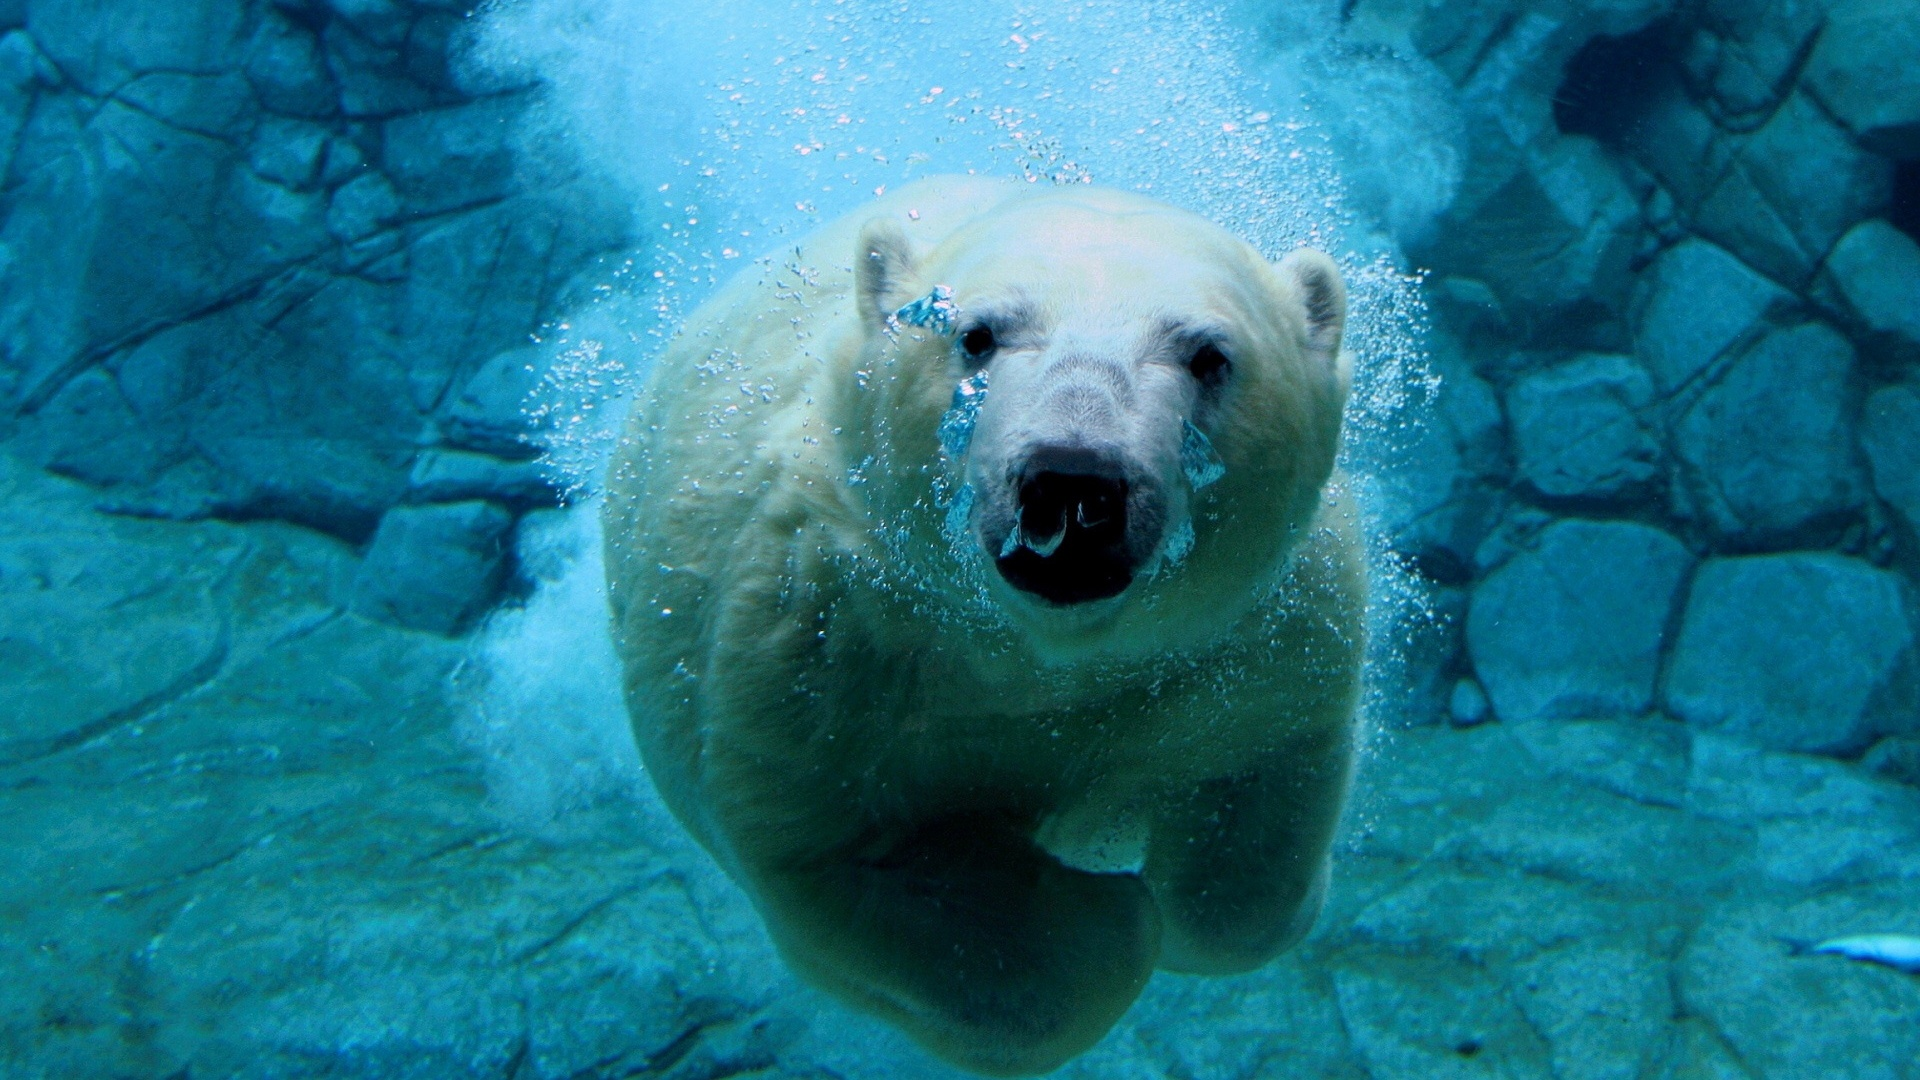 orso_bianco_sott_acqua